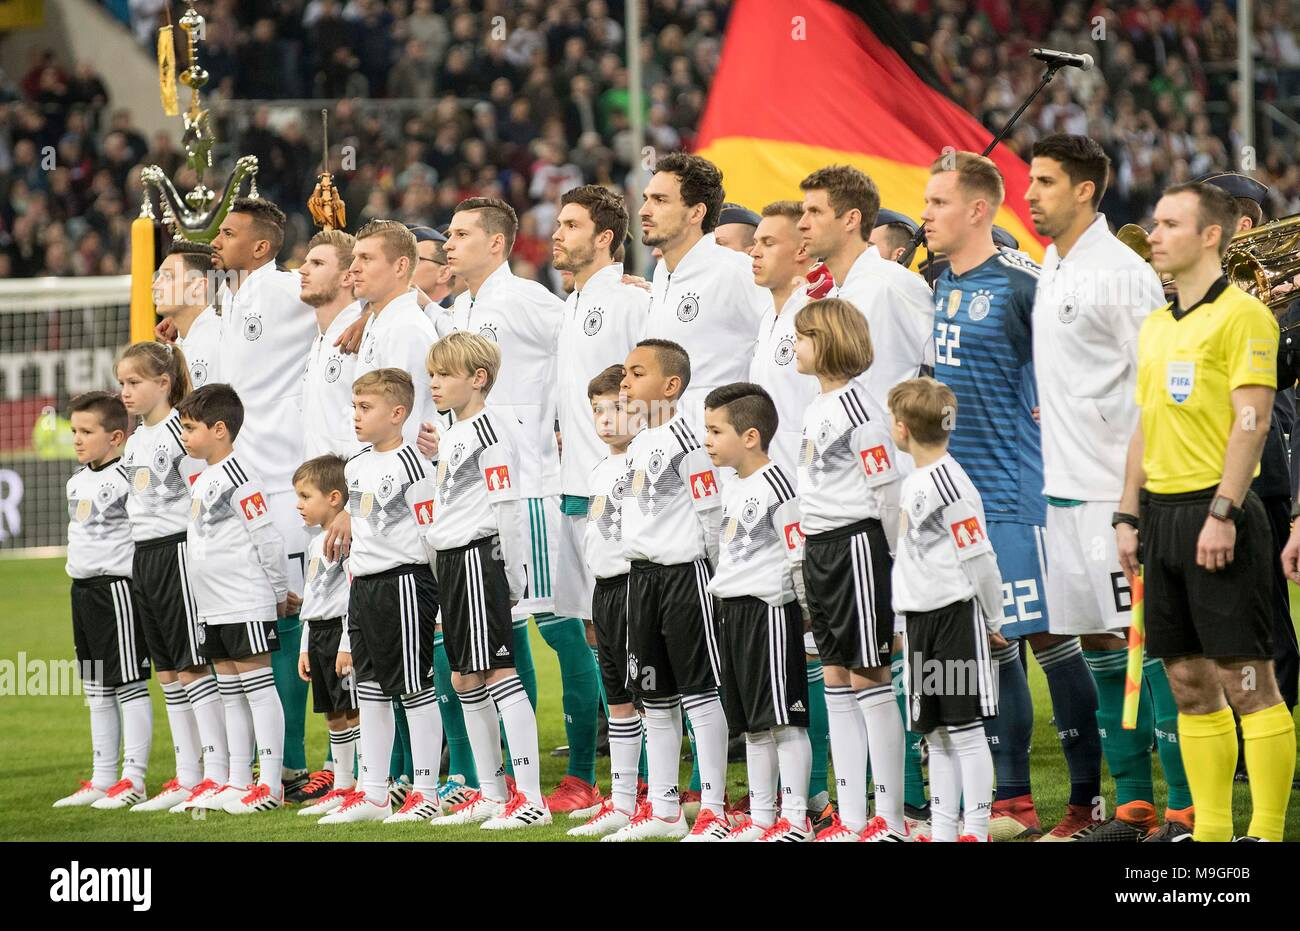 Thomas Muller And Mesut Ozil Stock Photos   Thomas Muller And Mesut ... cc48f2b7bb143